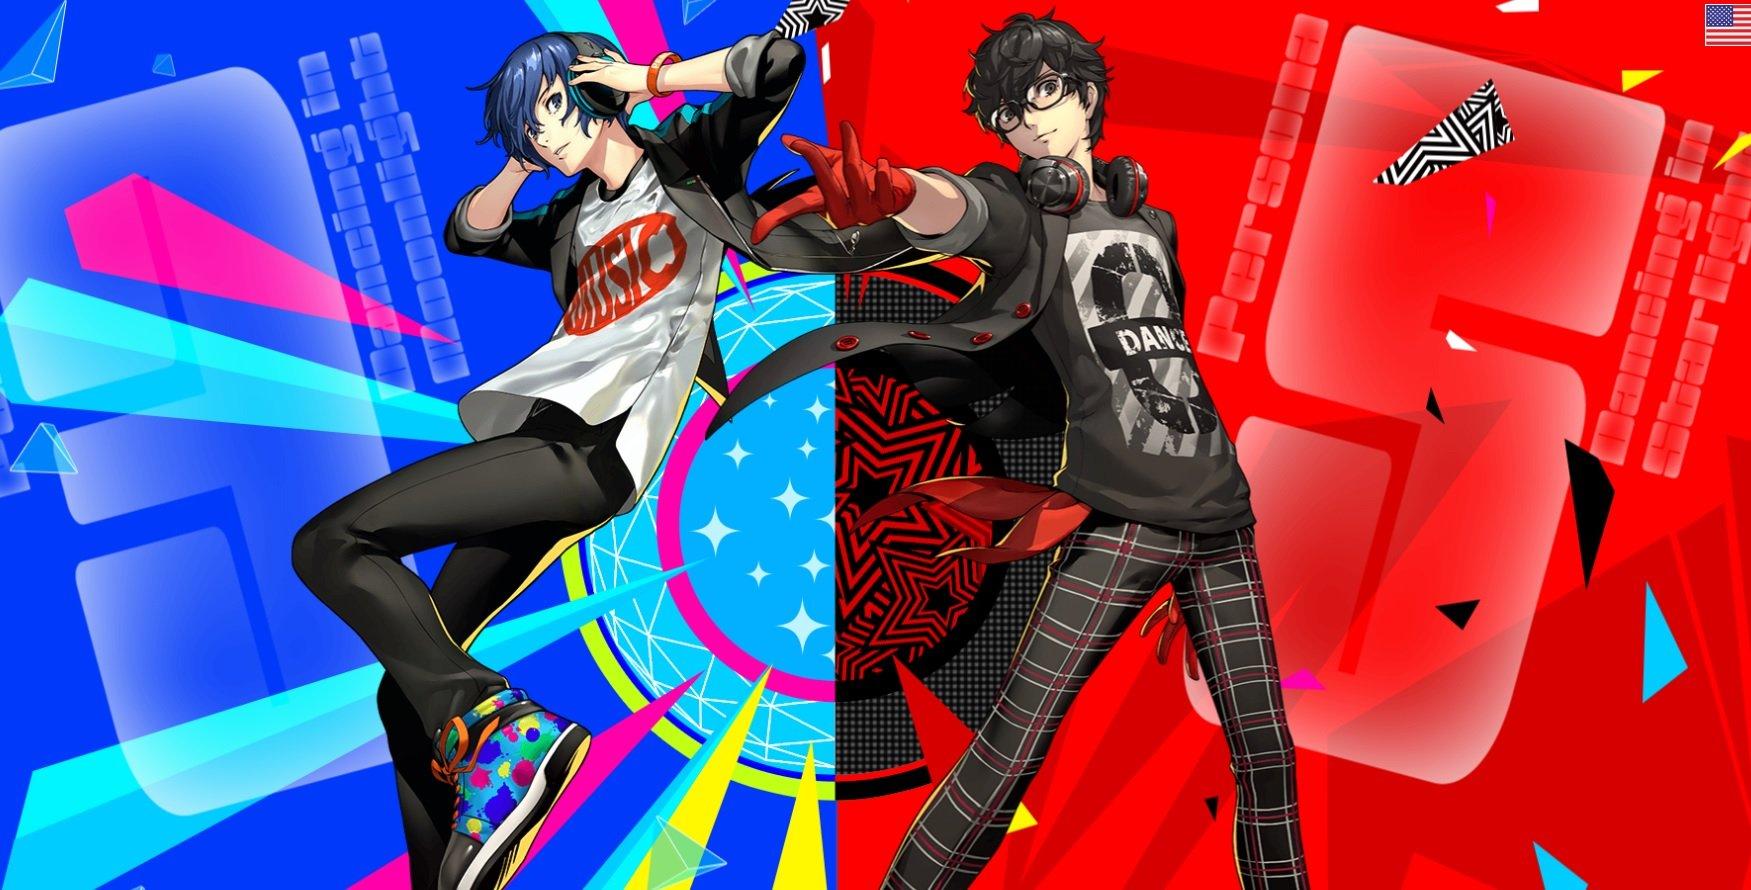 Persona 5 Dancing Star Night e Persona 3 Moon Night